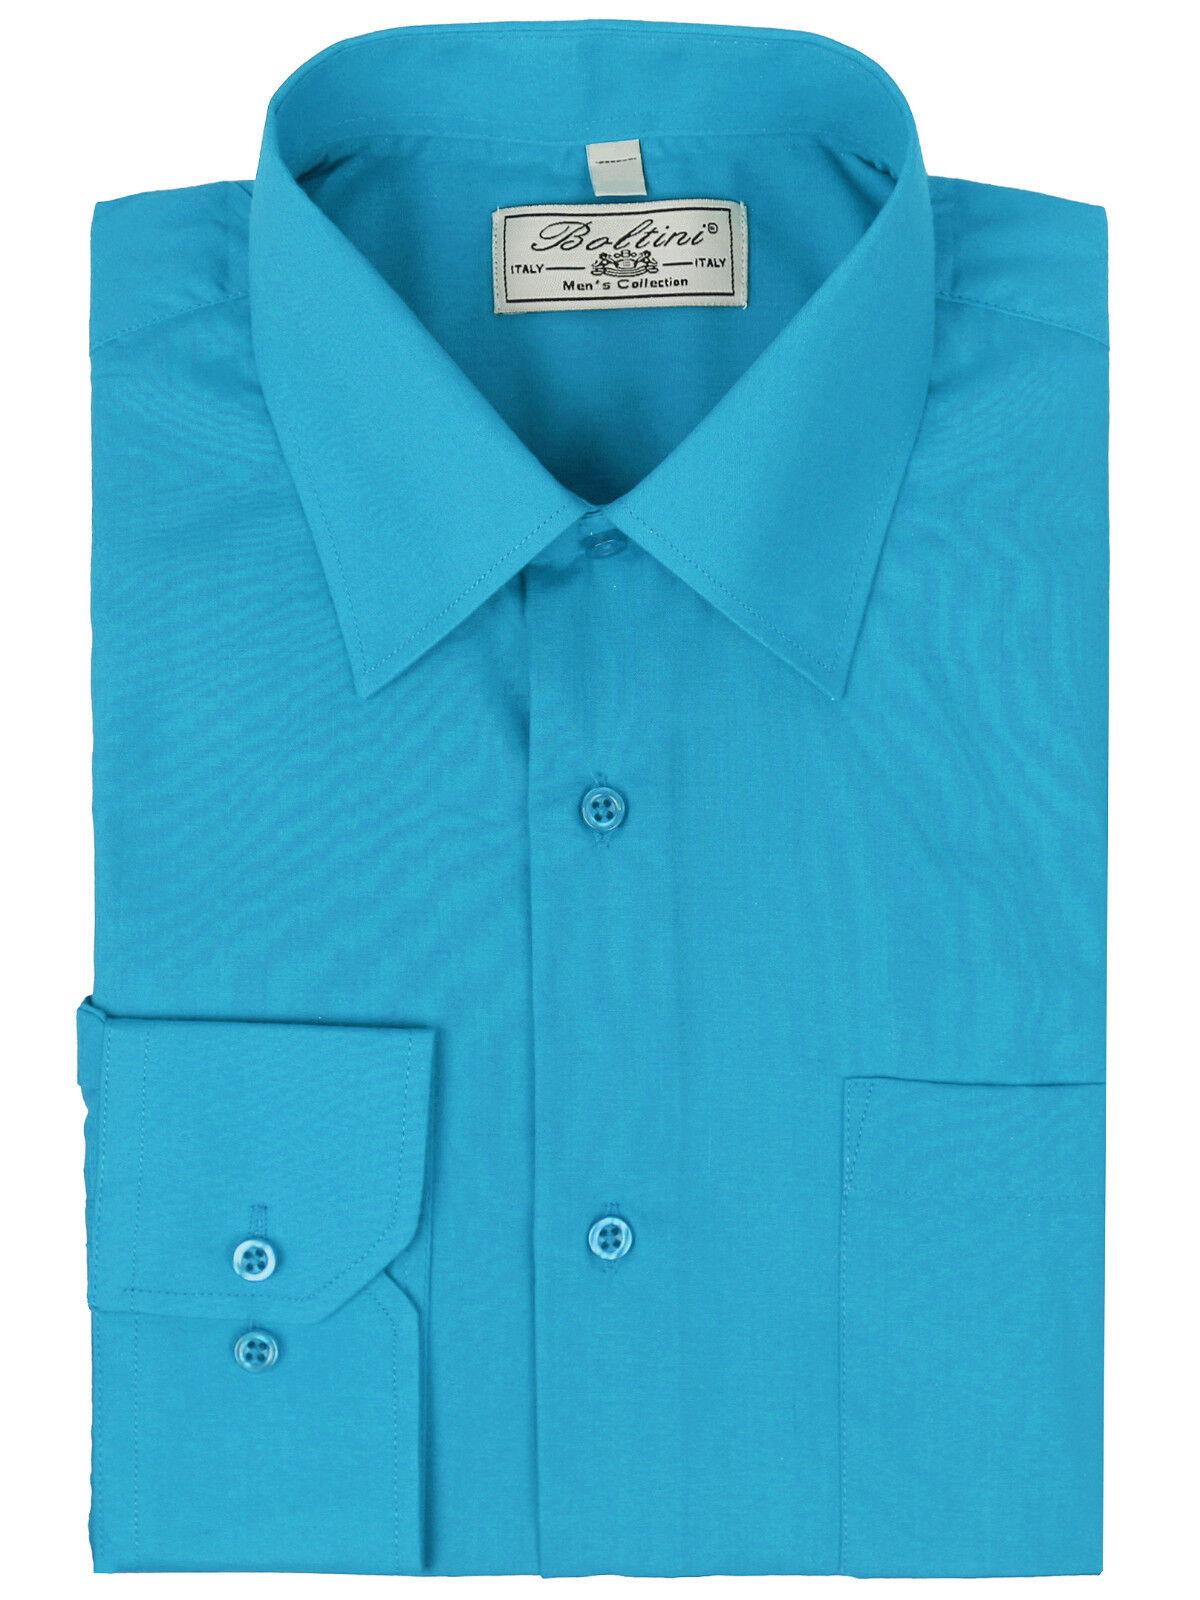 "Kirkland Signature custom fit L//S Formal Shirt Blue Diamond Weave taille 16/""x34//35"